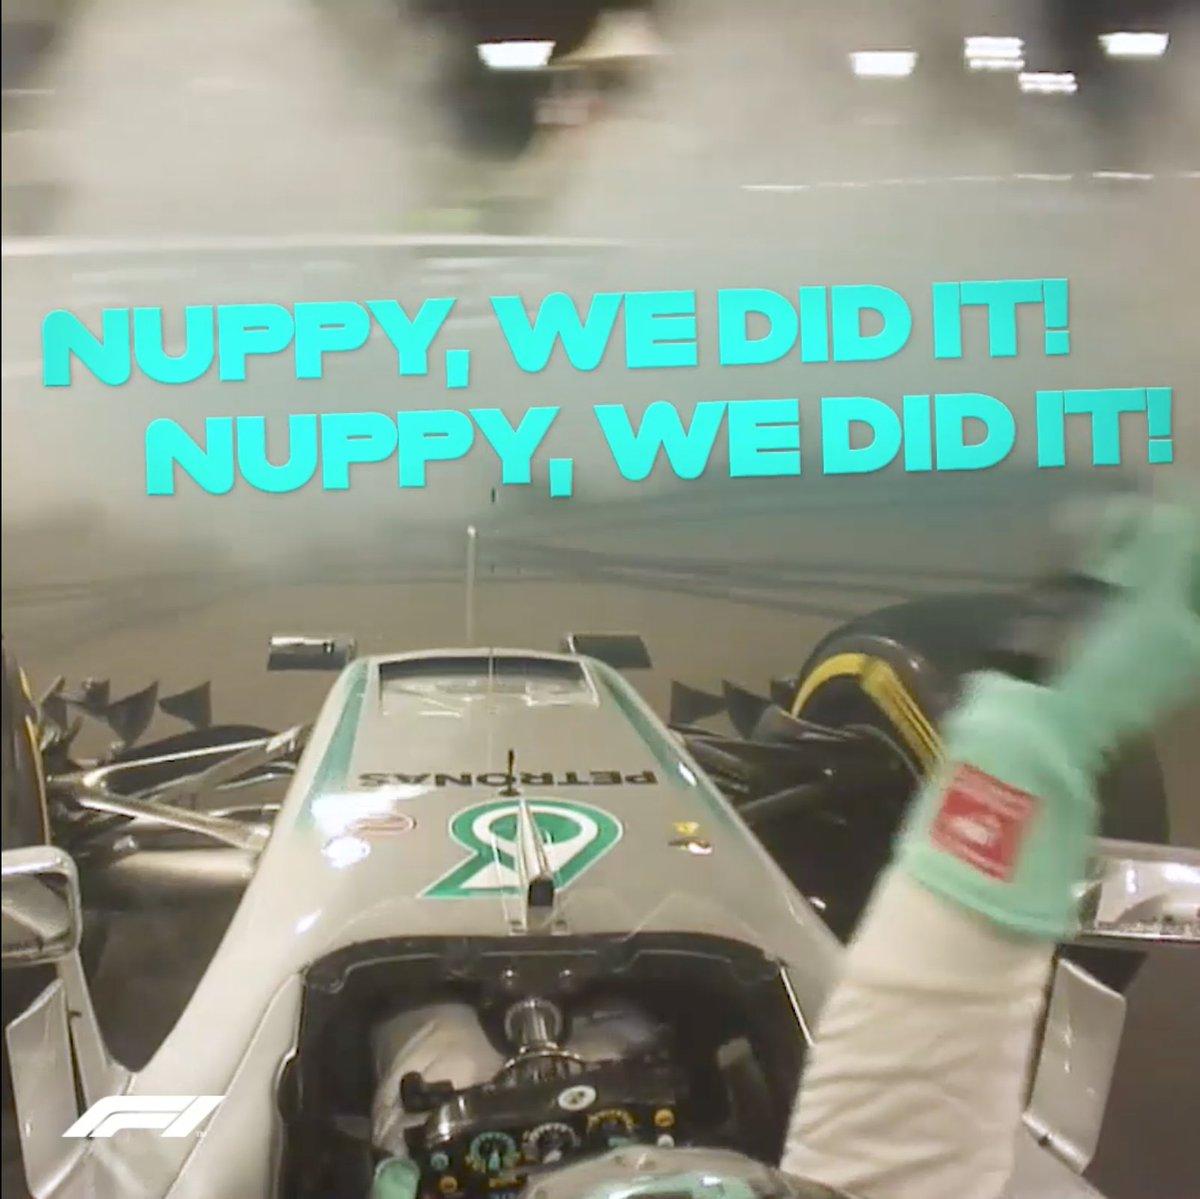 Nupppppy, we did itttttttt!!! 😍  #F1 #AbuDhabiGP ⏪ 2016